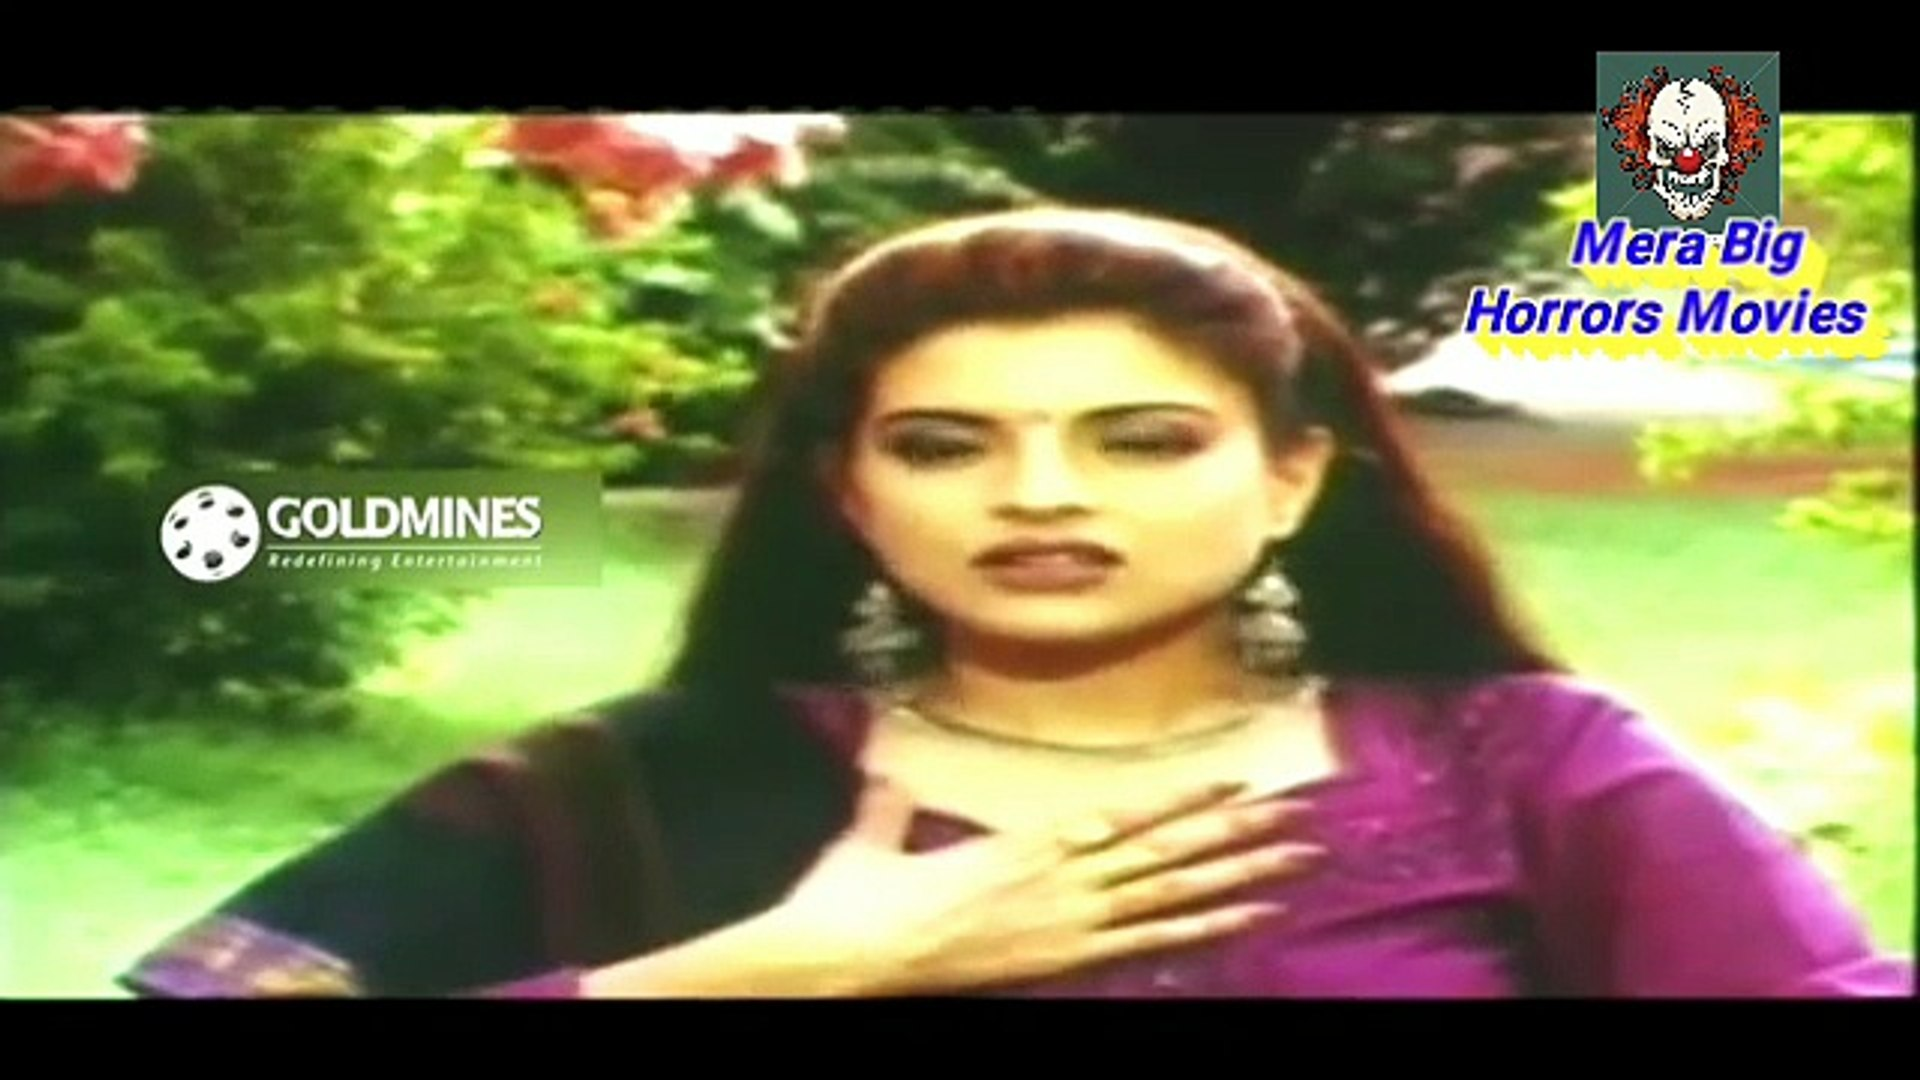 Kala Mandir Horror Hindi Movie Part 2/2 ☣☣☣ (21) ☣☣☣ Mera Big Horror Movies